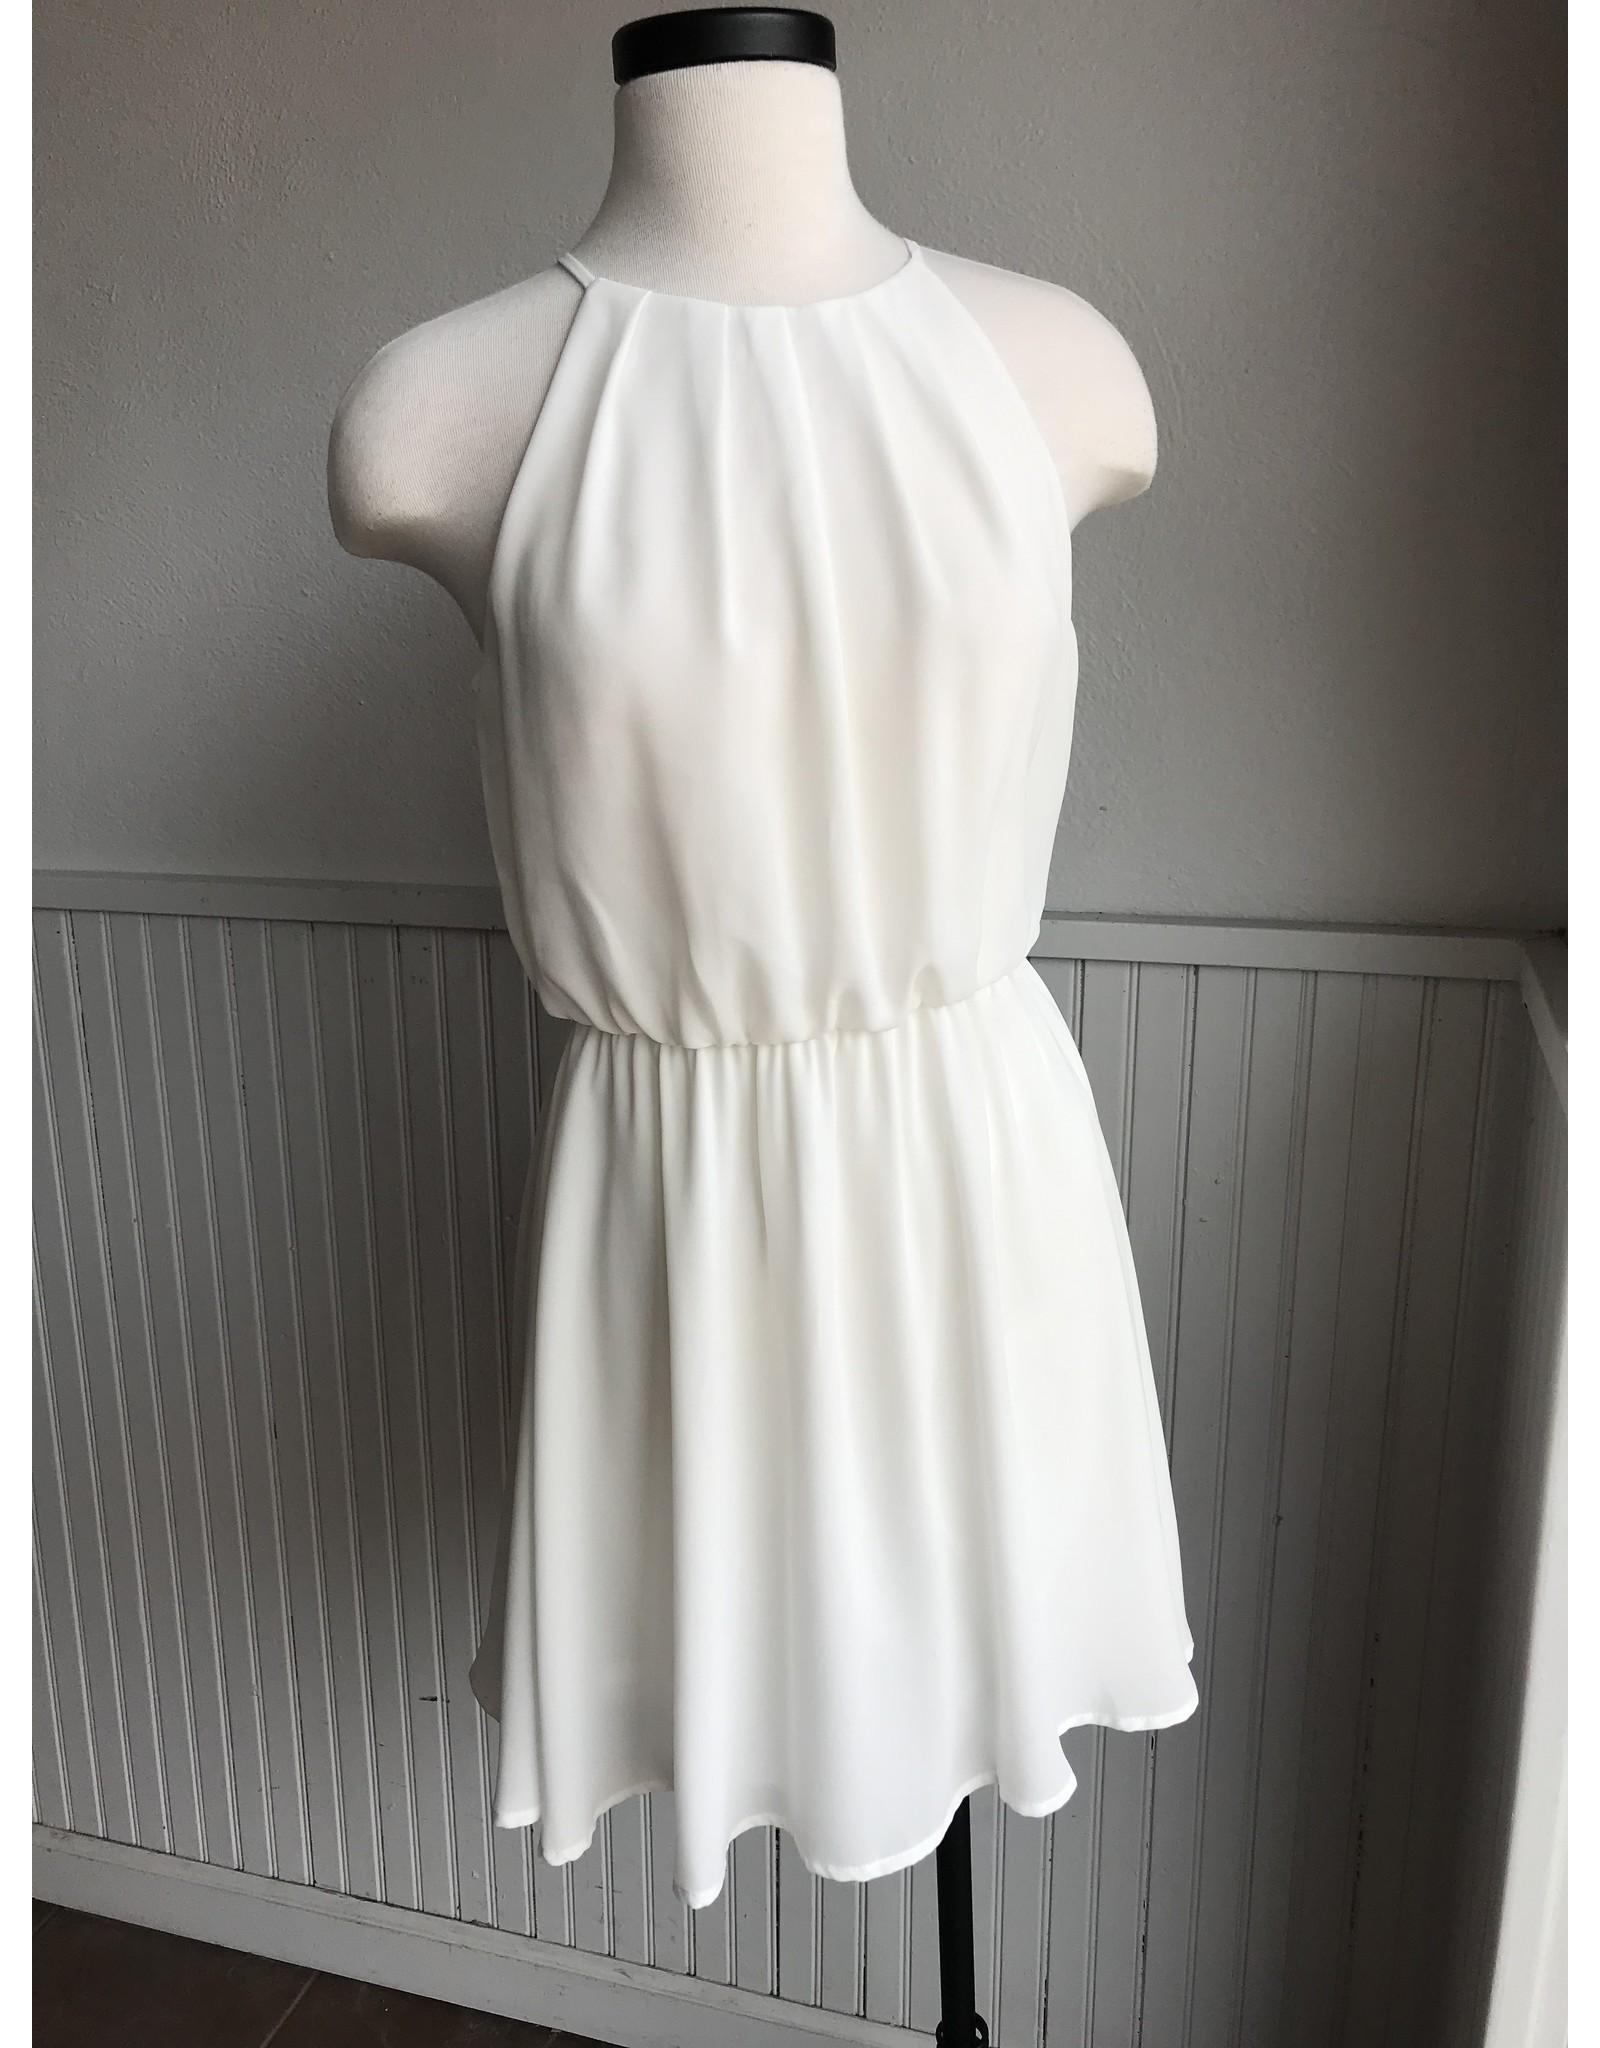 AMALTHEA PLEATED DRESS